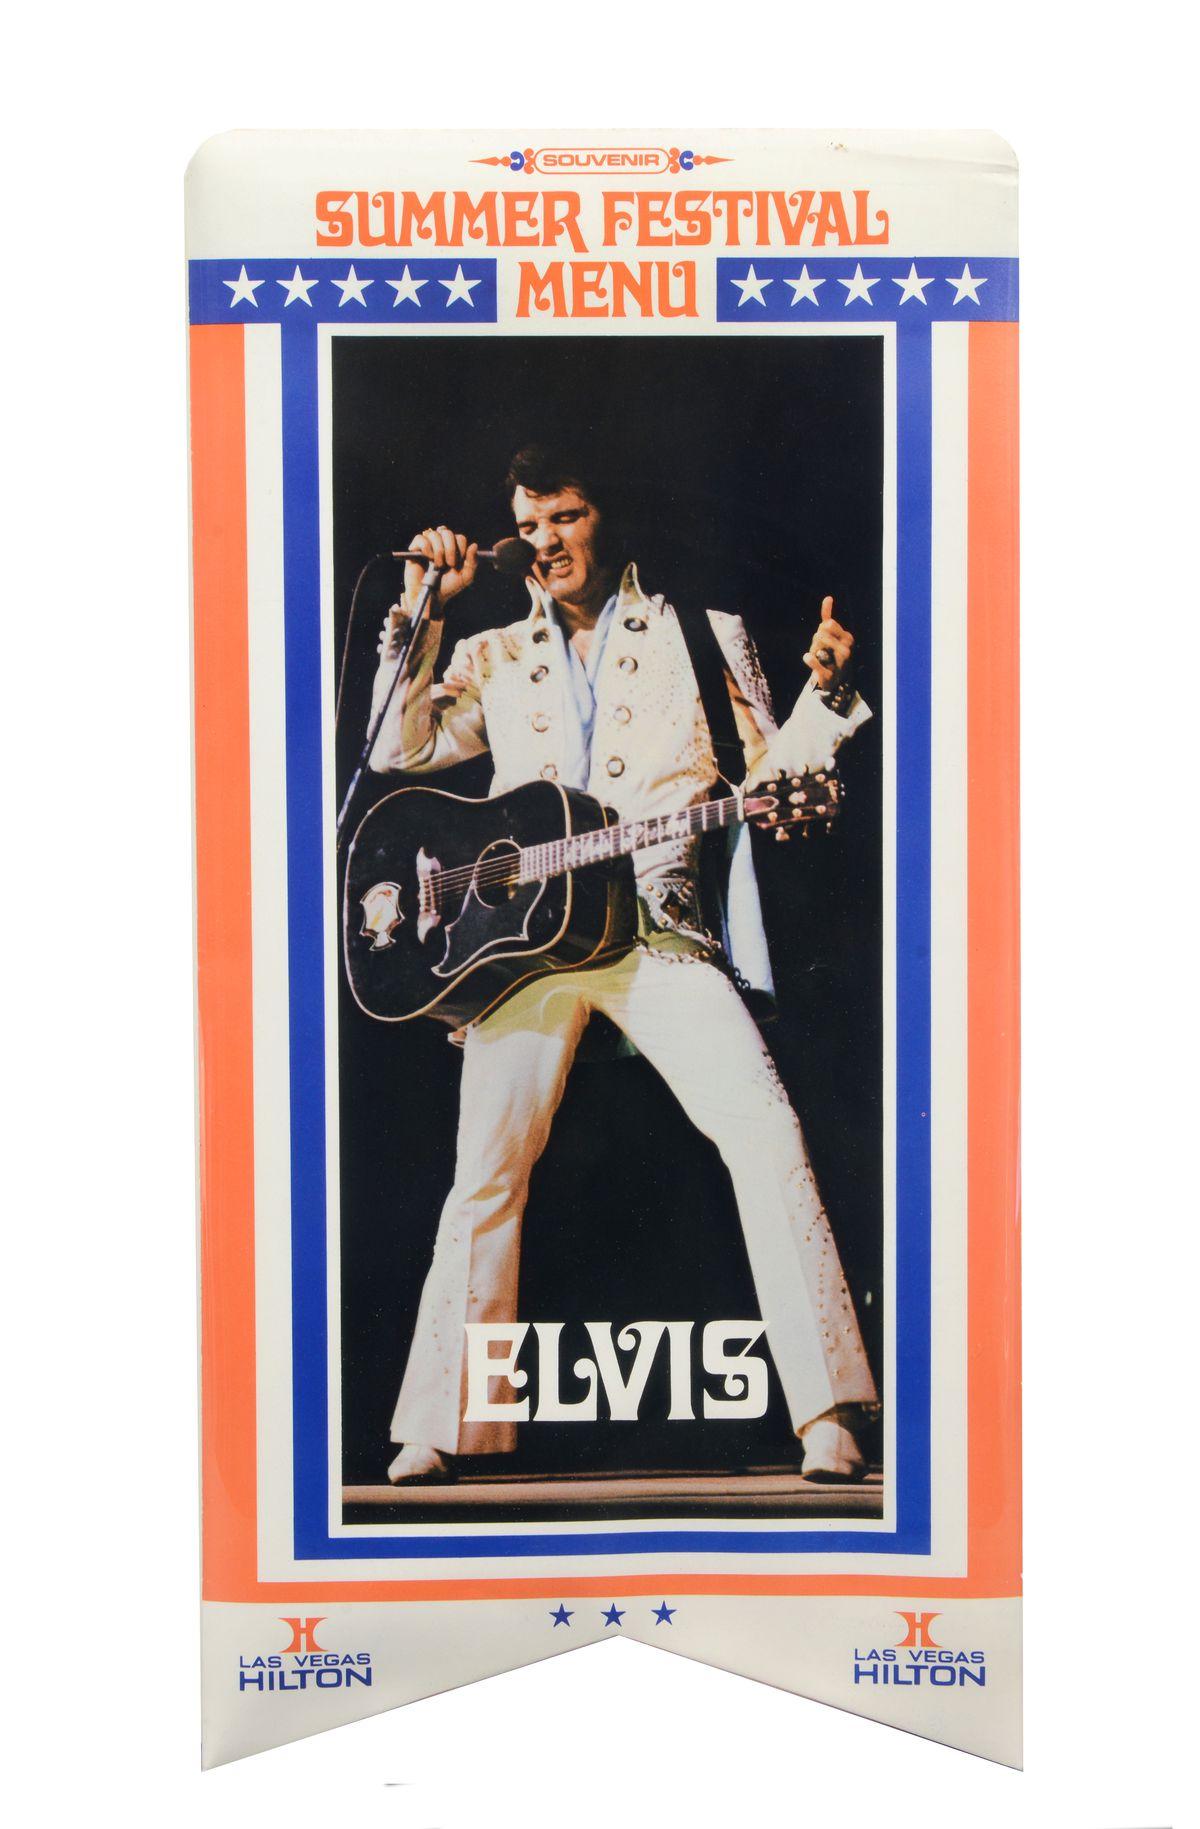 Elvis summer fest menu